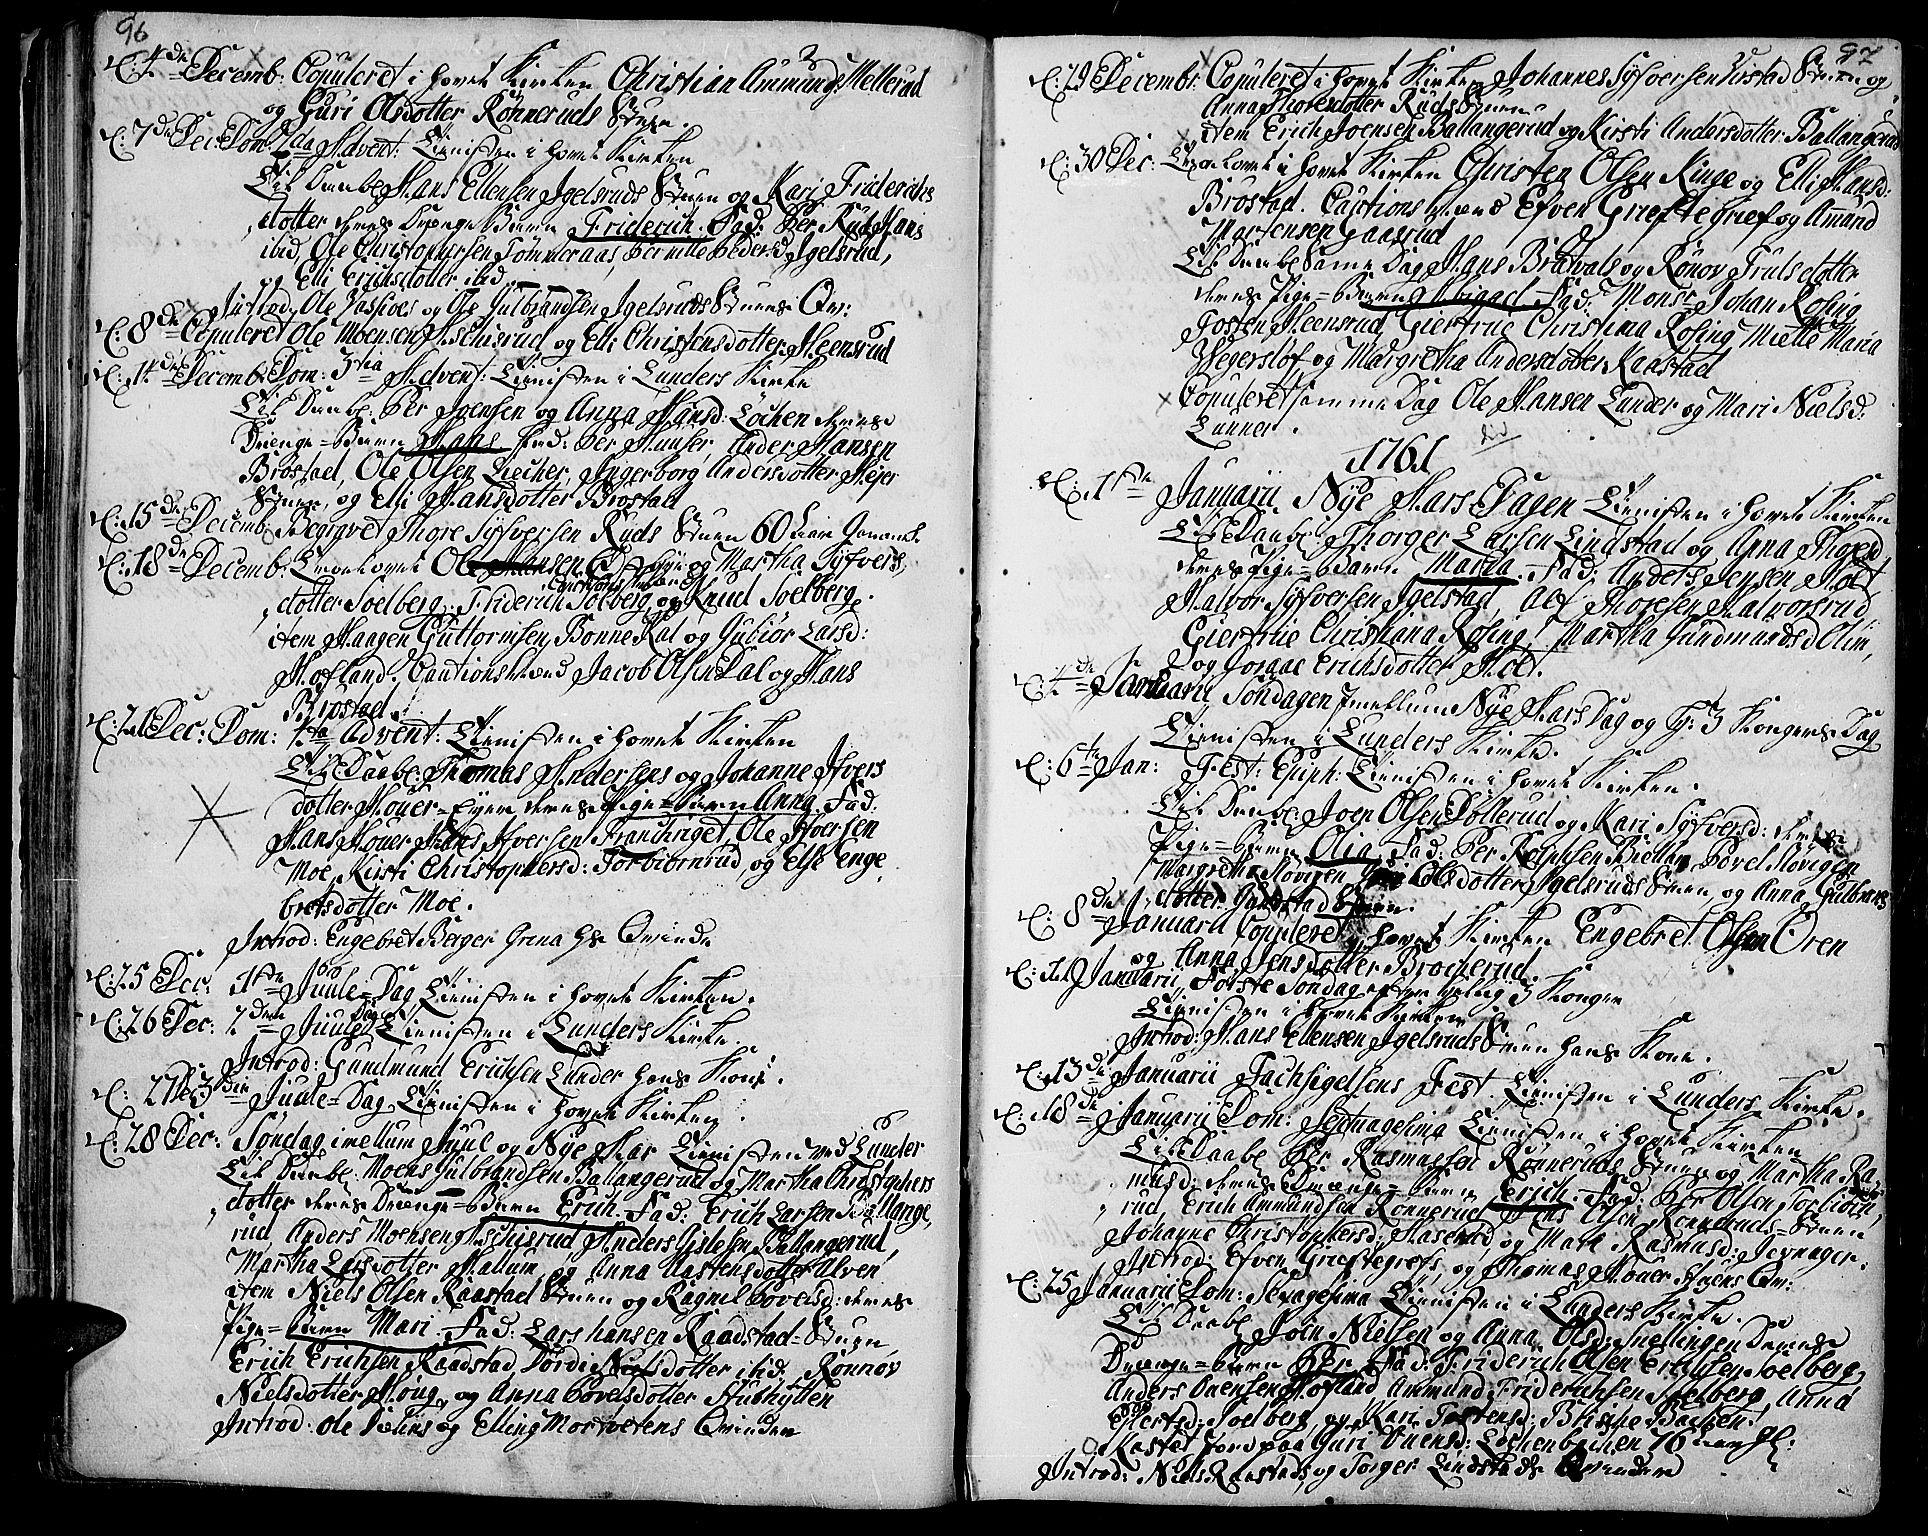 SAH, Jevnaker prestekontor, Ministerialbok nr. 3, 1752-1799, s. 96-97